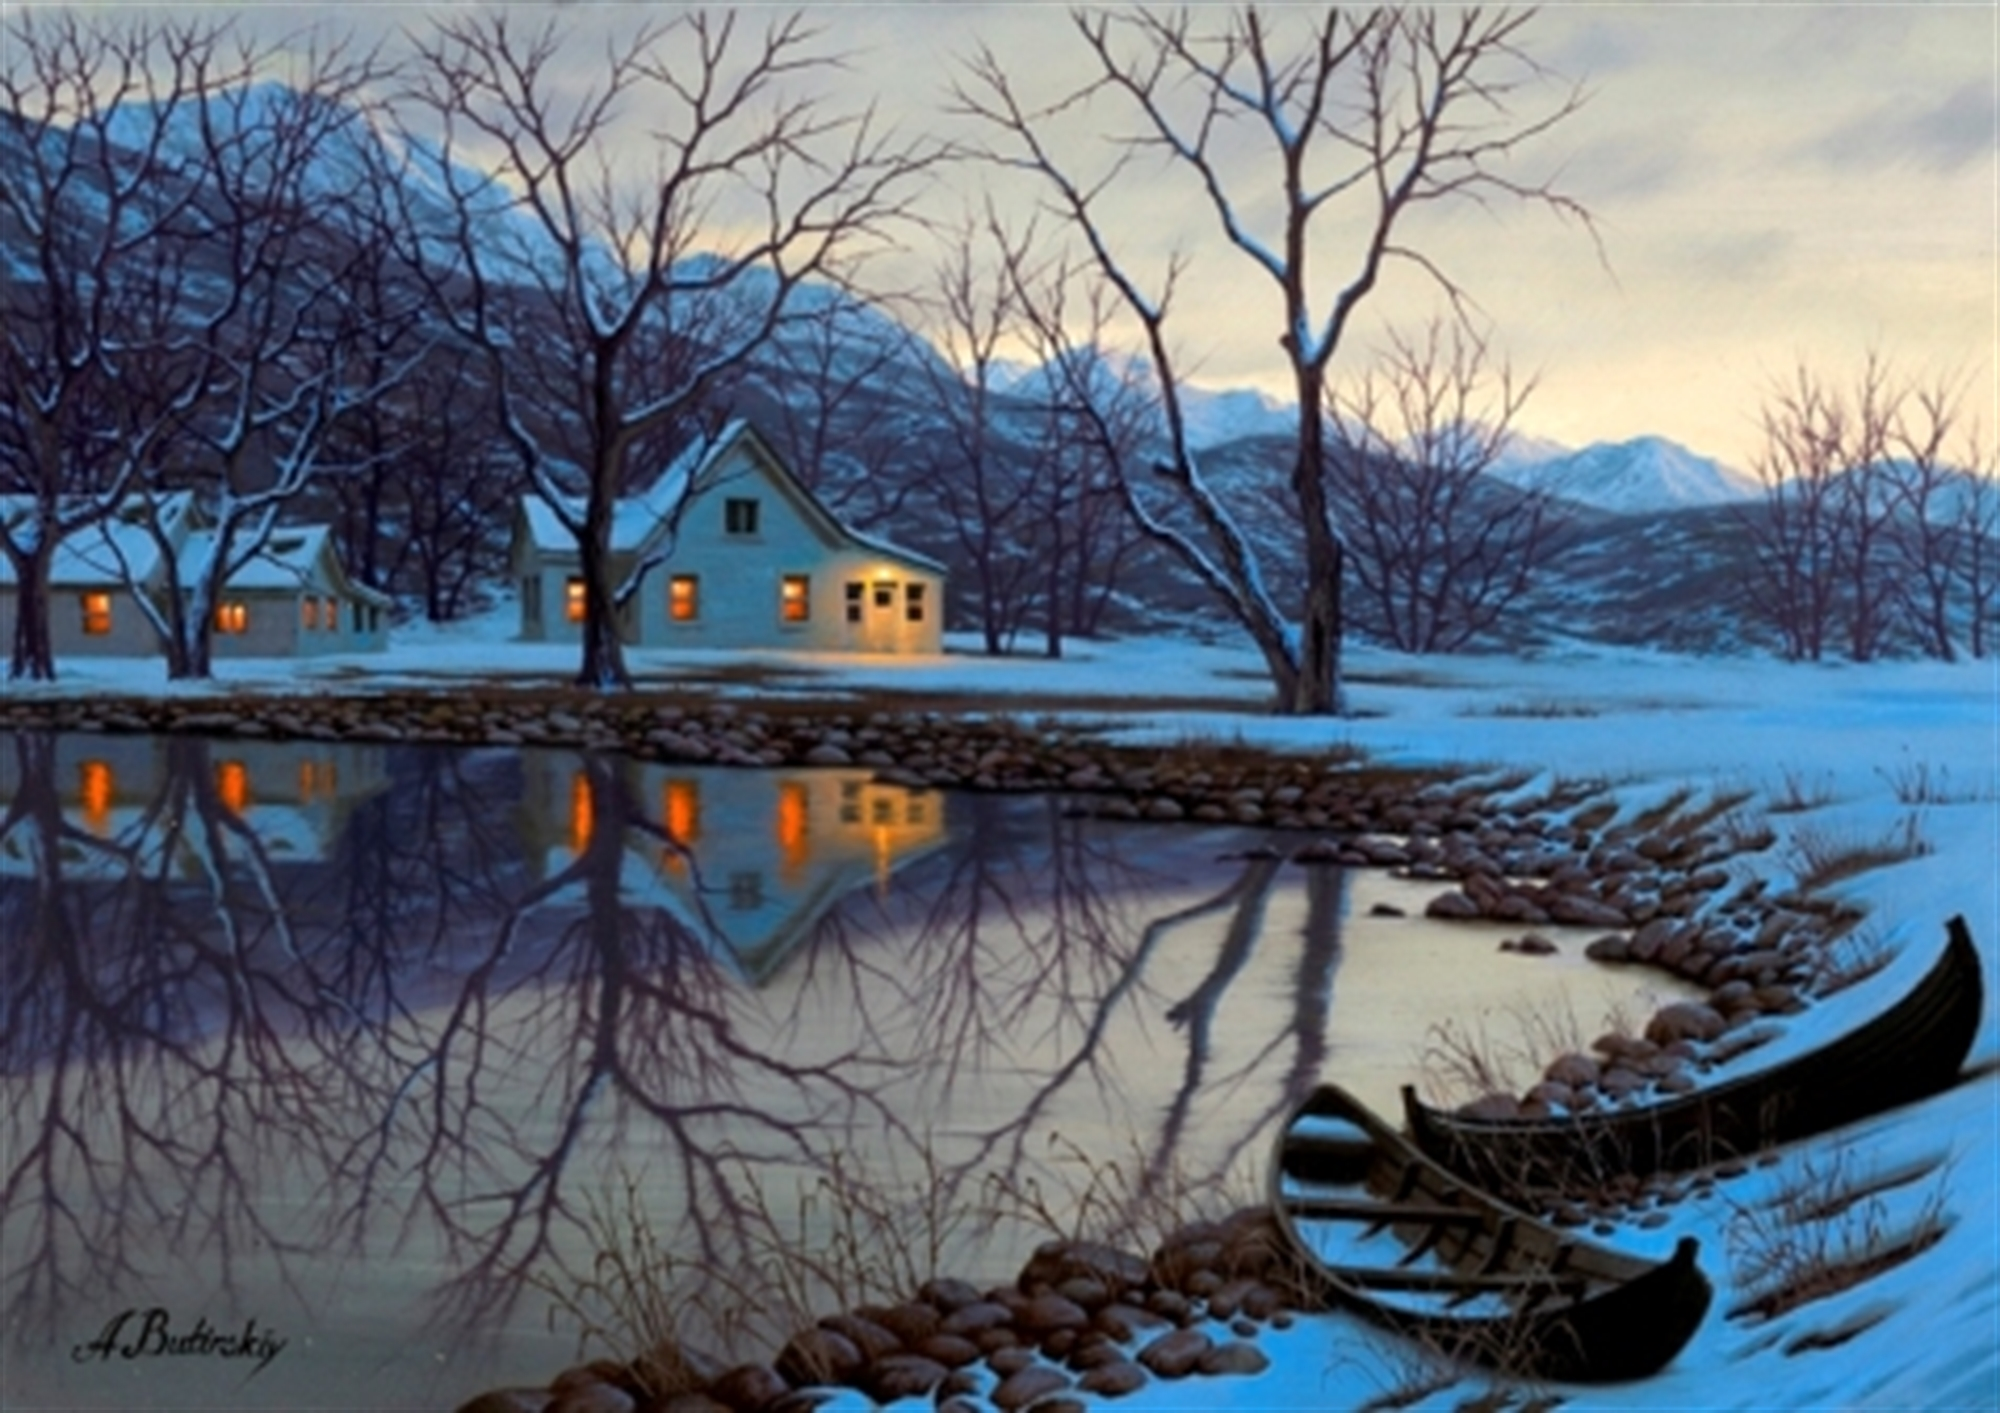 The Lake House by Alexei Butirskiy